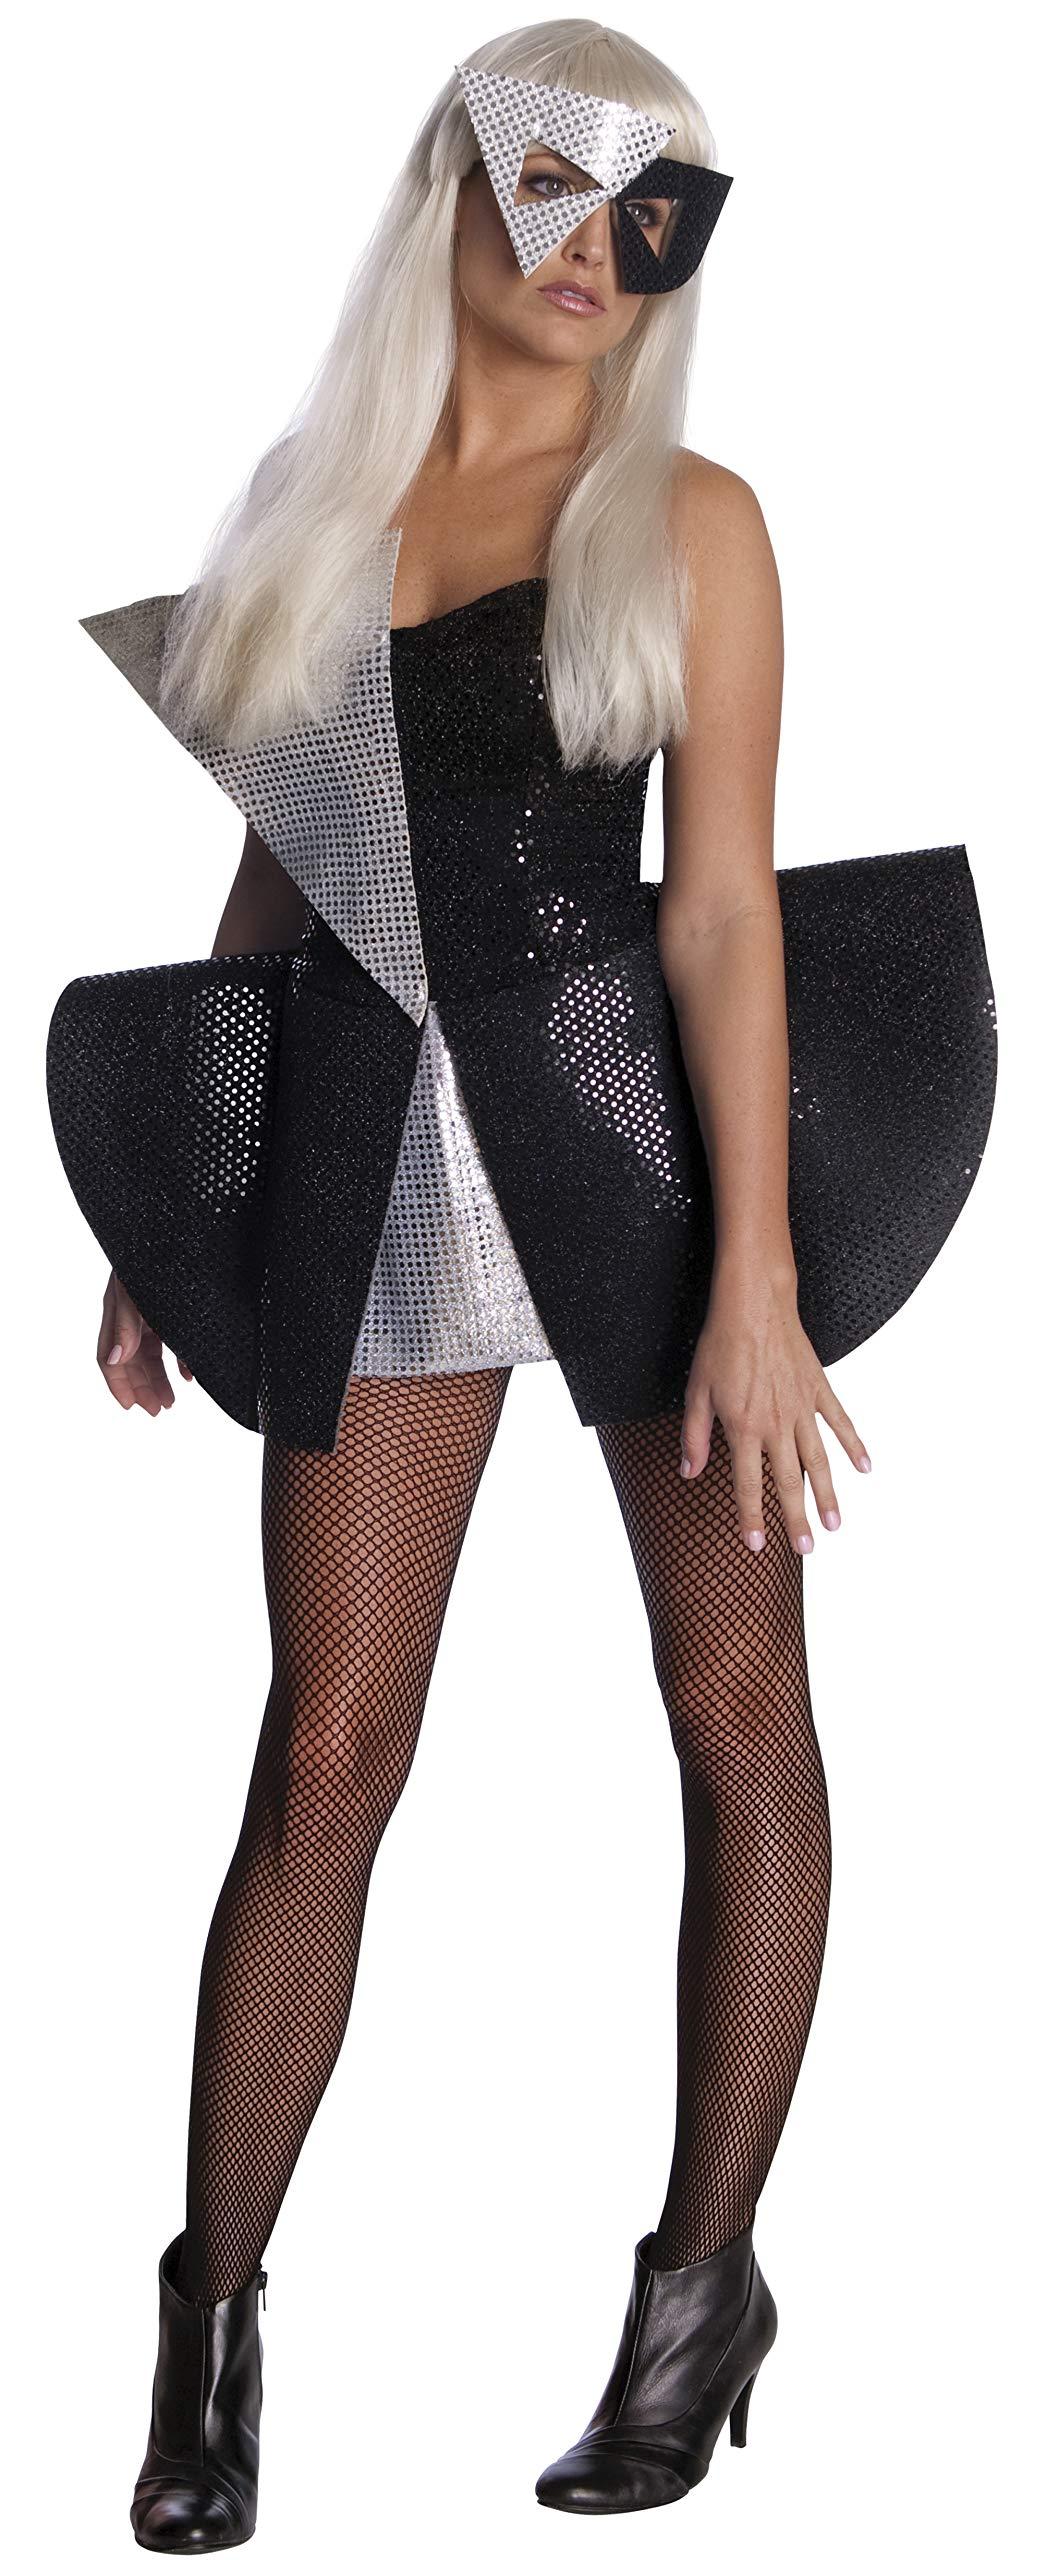 Rubbies - Disfraz de Lady Gaga para mujer, talla XS (889976XS ...